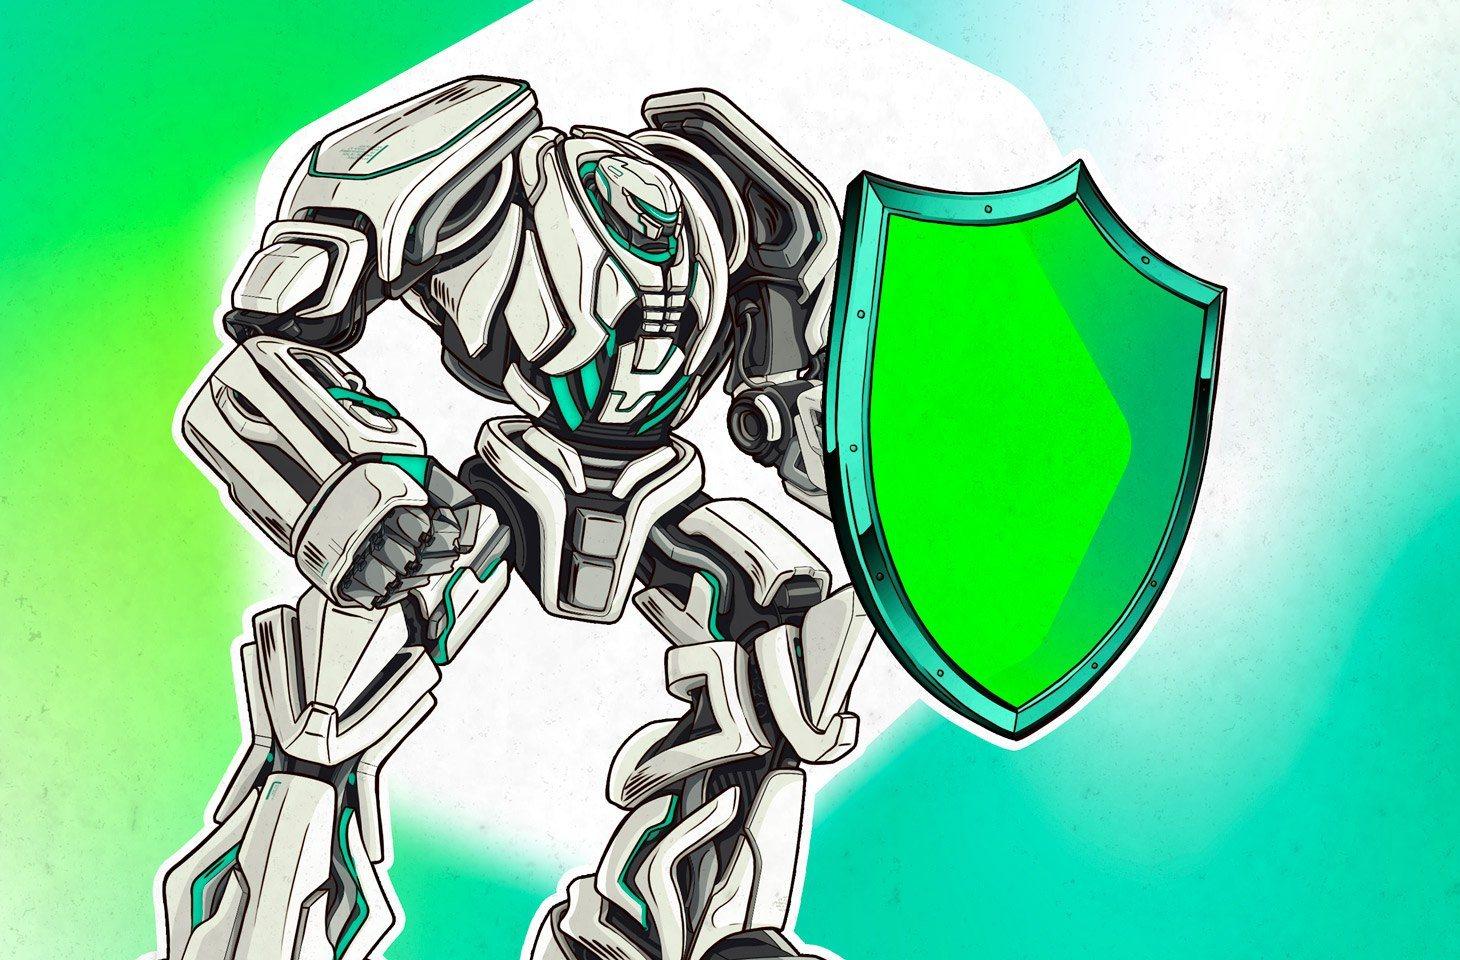 New Virus 2020 What's new in Kaspersky 2020 security solutions | Kaspersky